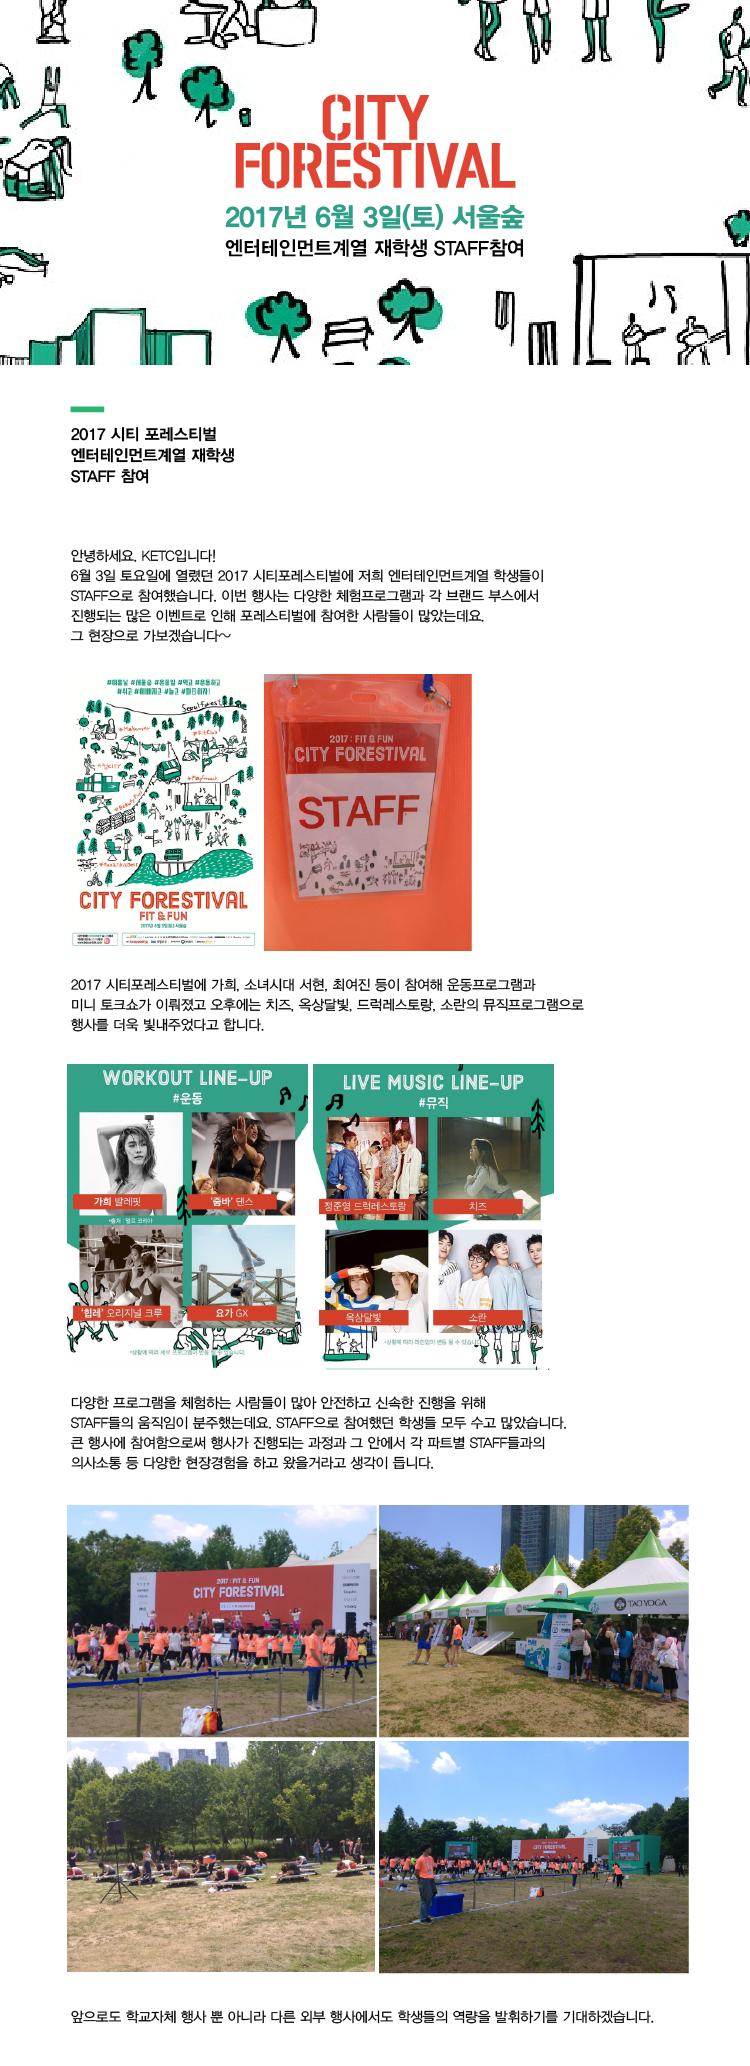 2017 CITY FORESTIVAL 엔터테인먼트계열 재학생 STAFF참여!